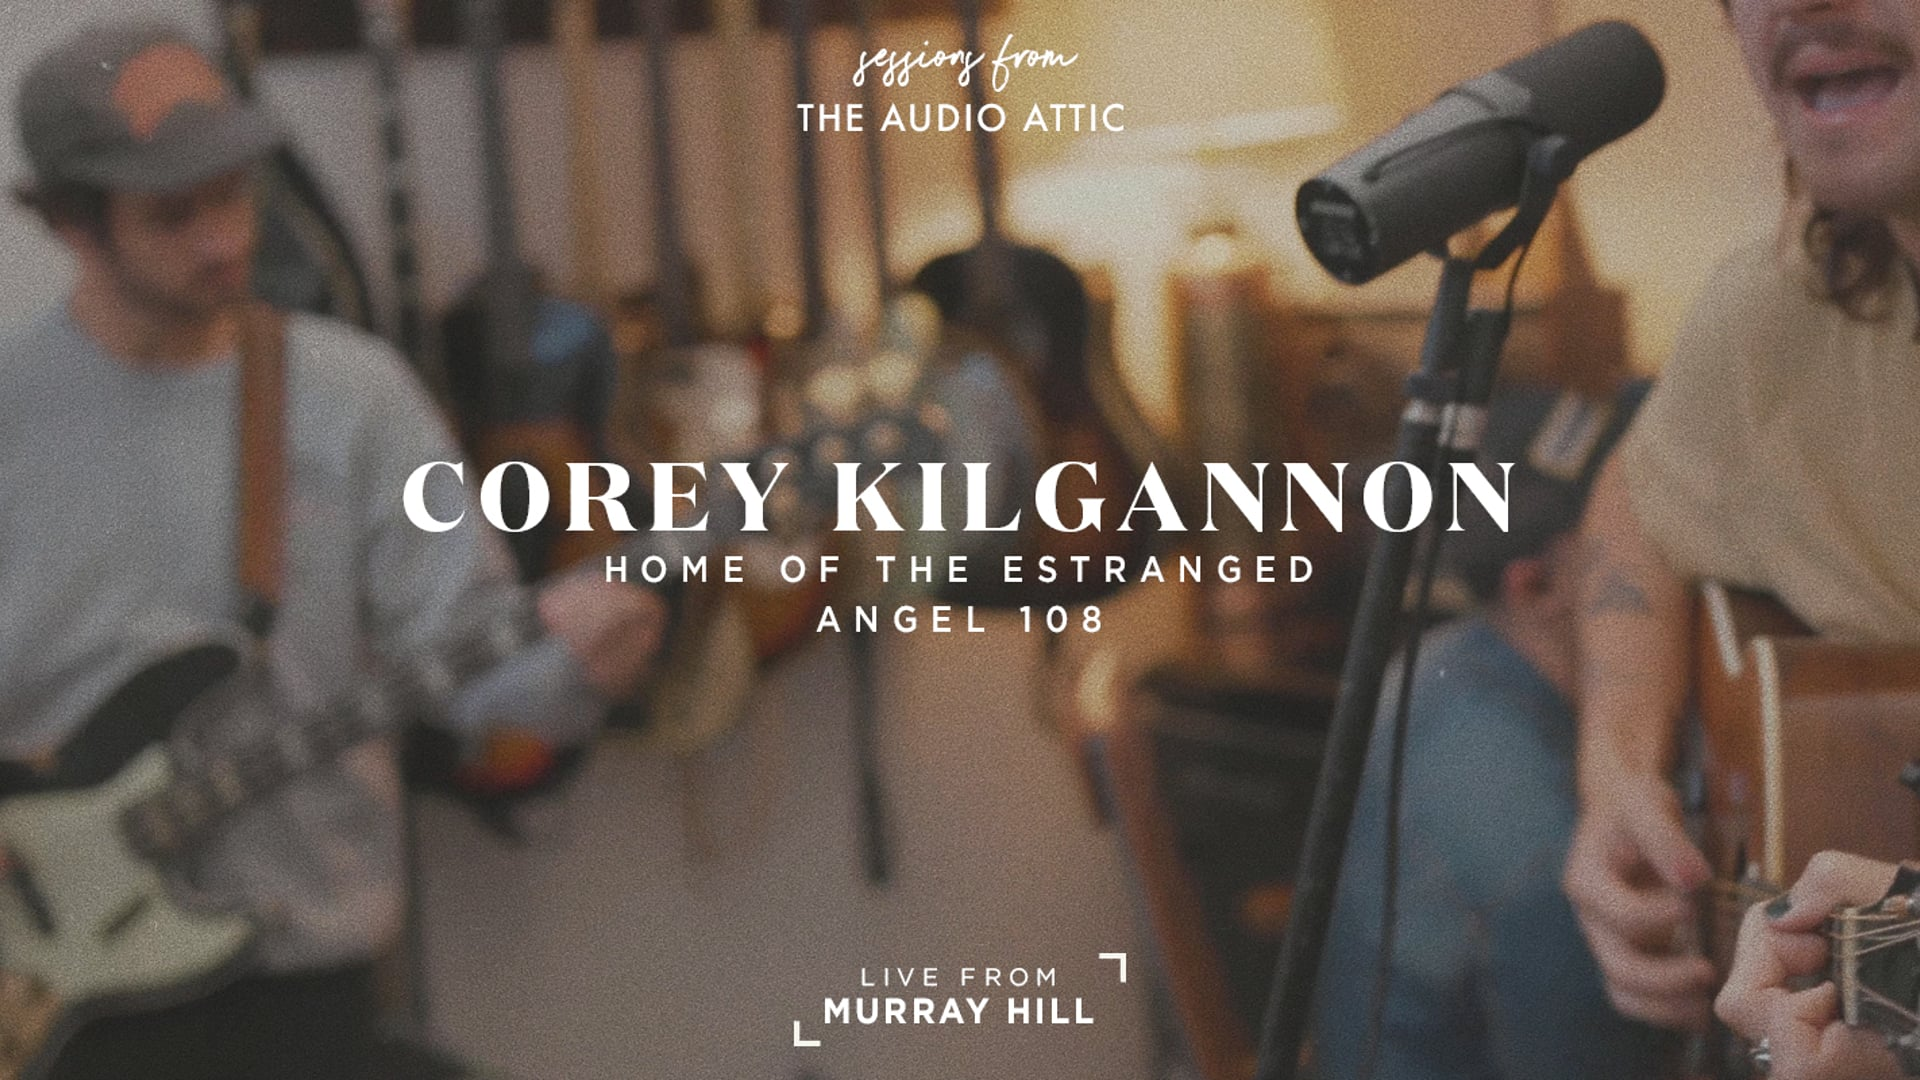 Corey Kilgannon X Audio Attic _ home of the estranged